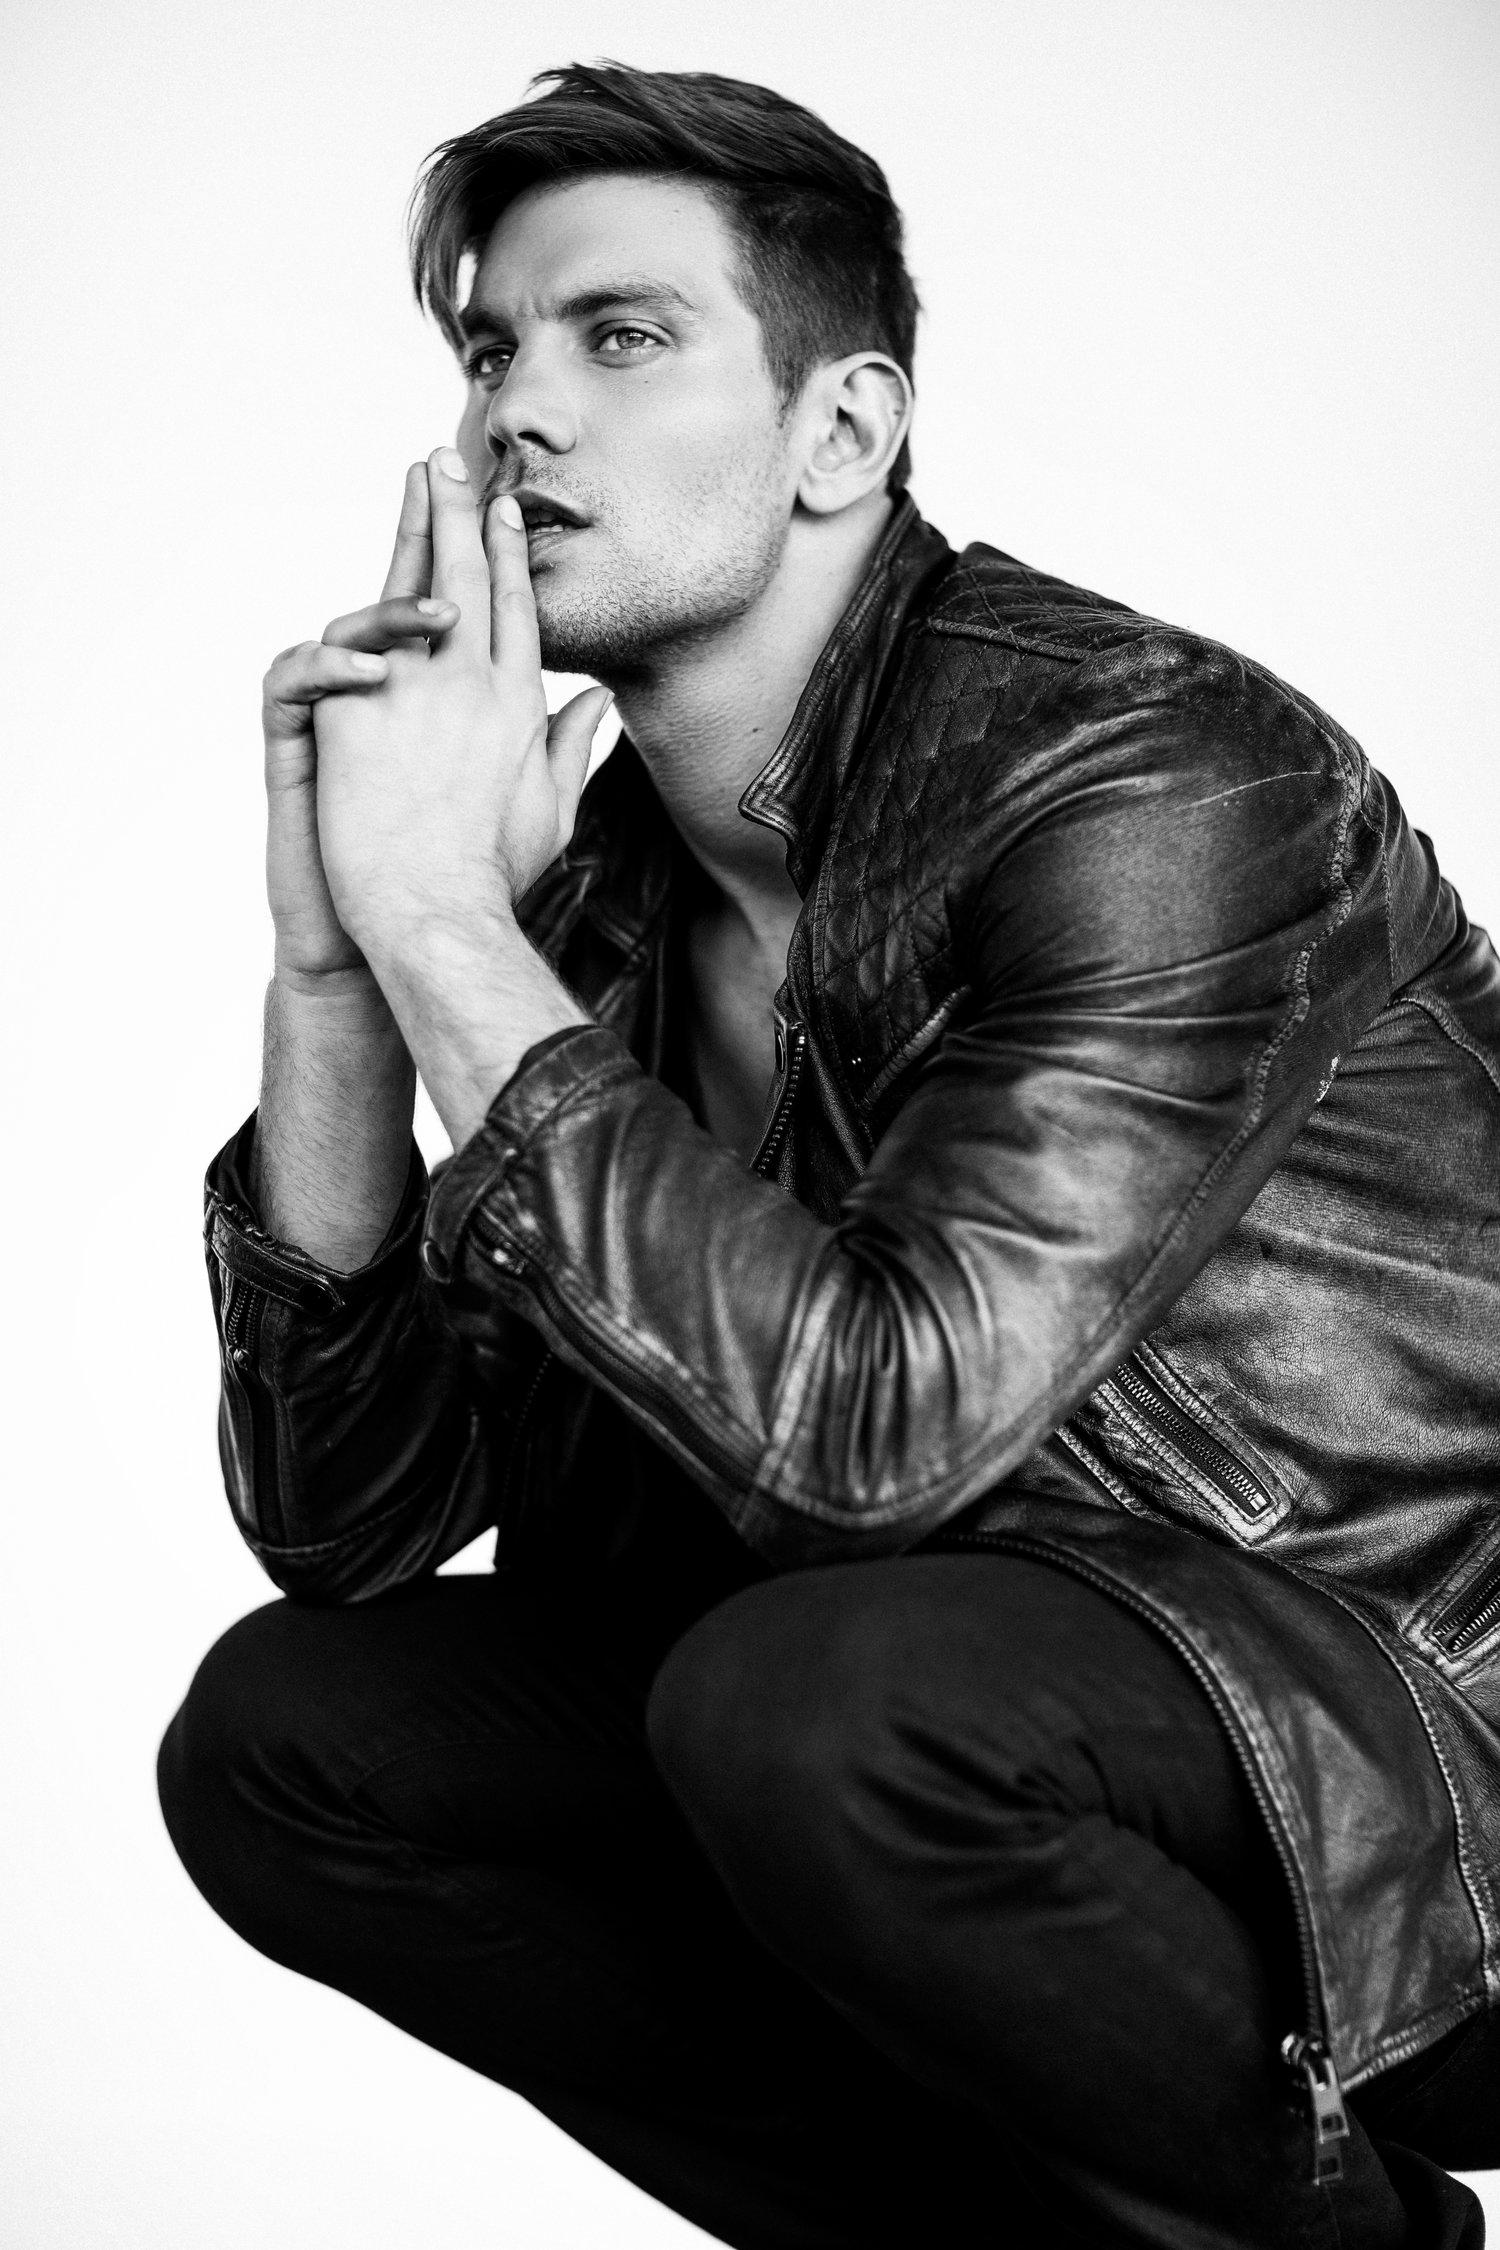 Adon Exclusive: Model Don Hood By Blake Ballard